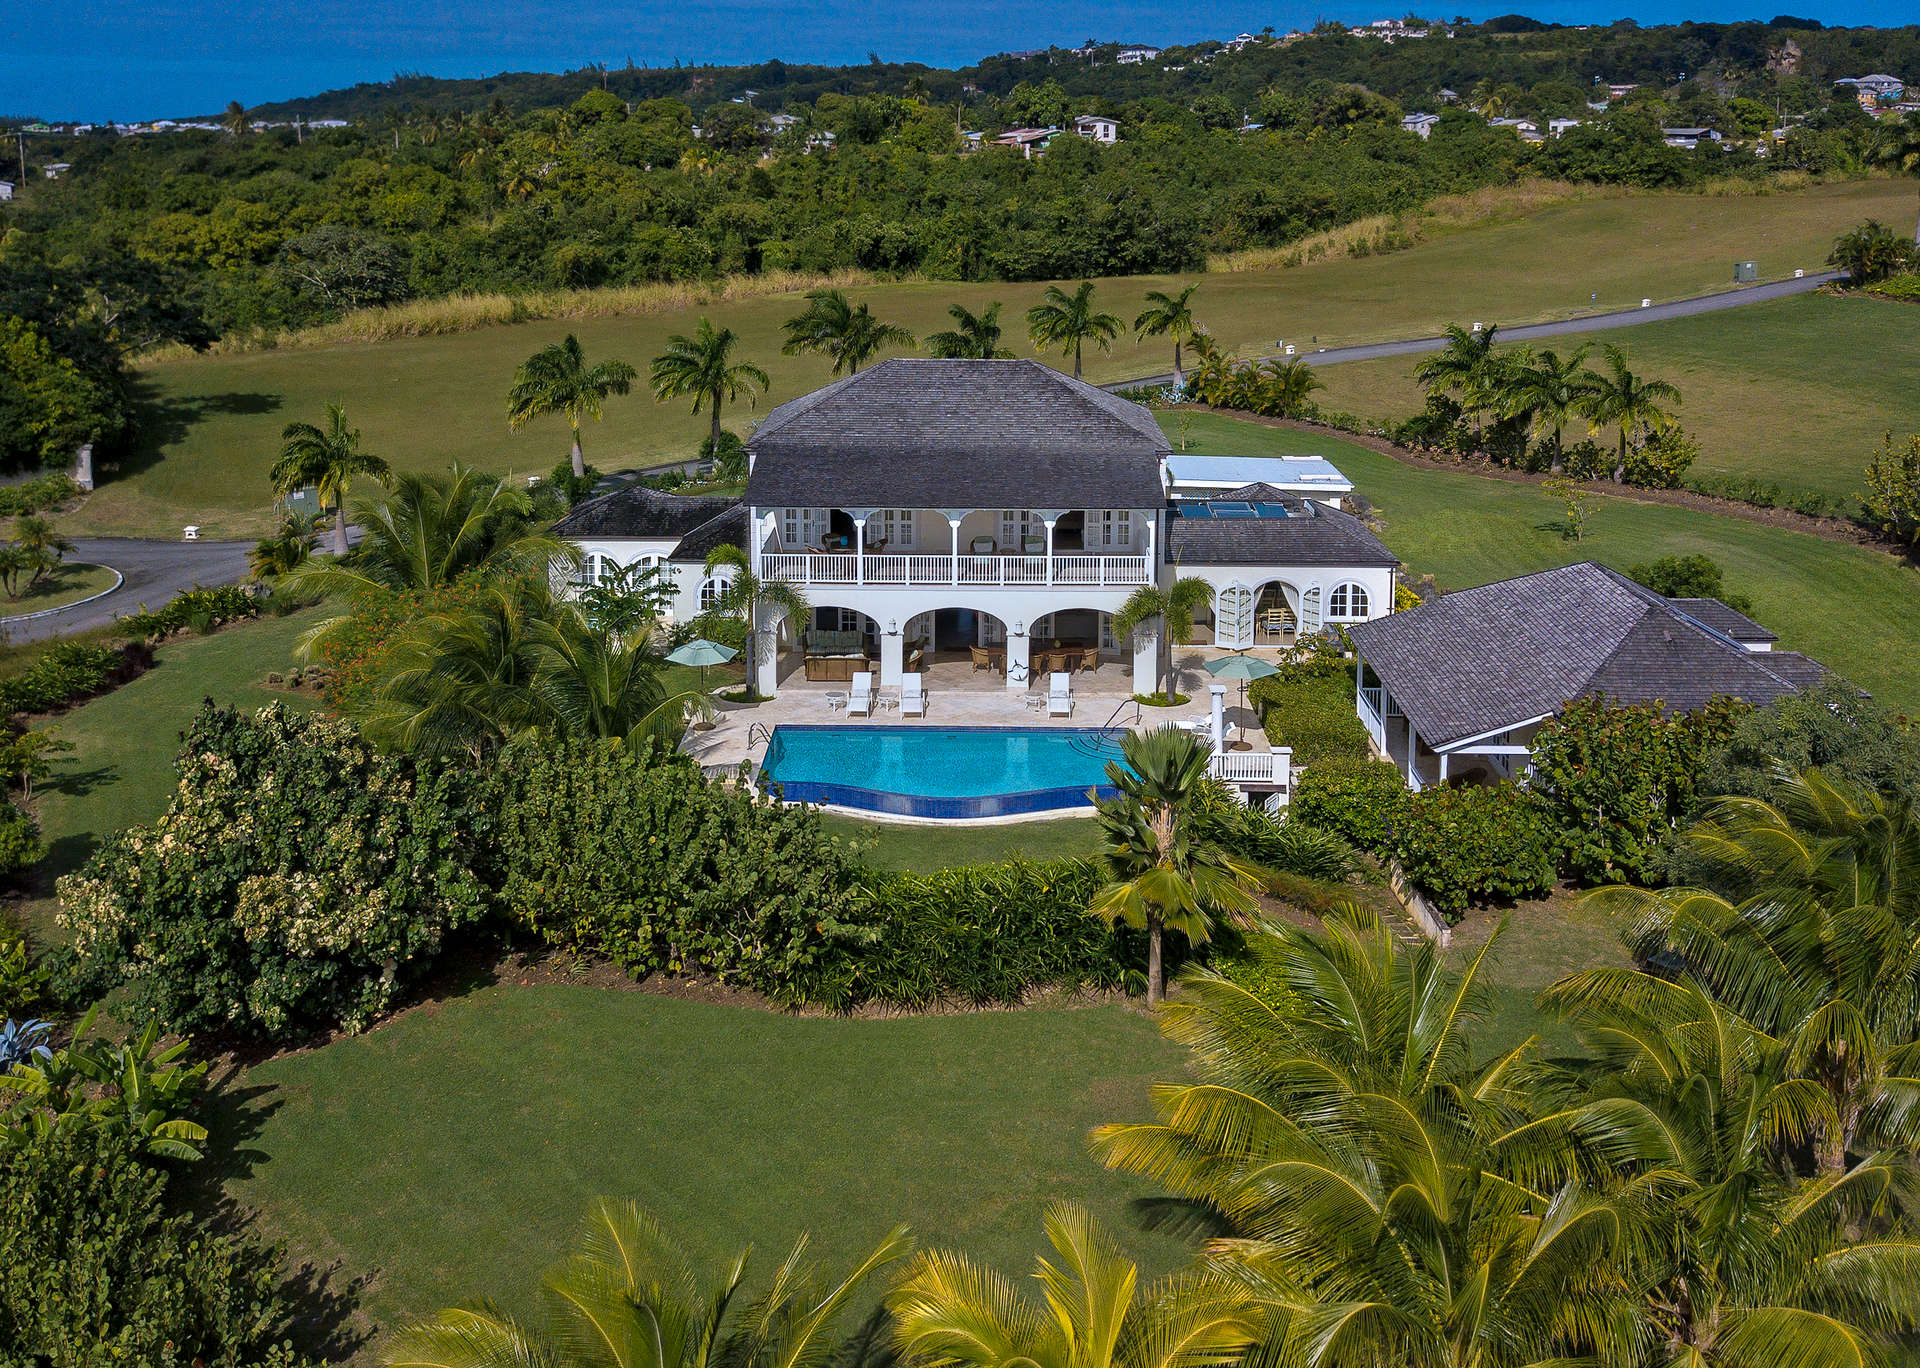 Luxury villa rentals caribbean - Barbados - St james - Royal westmoreland golf resort - Howzat - Image 1/14